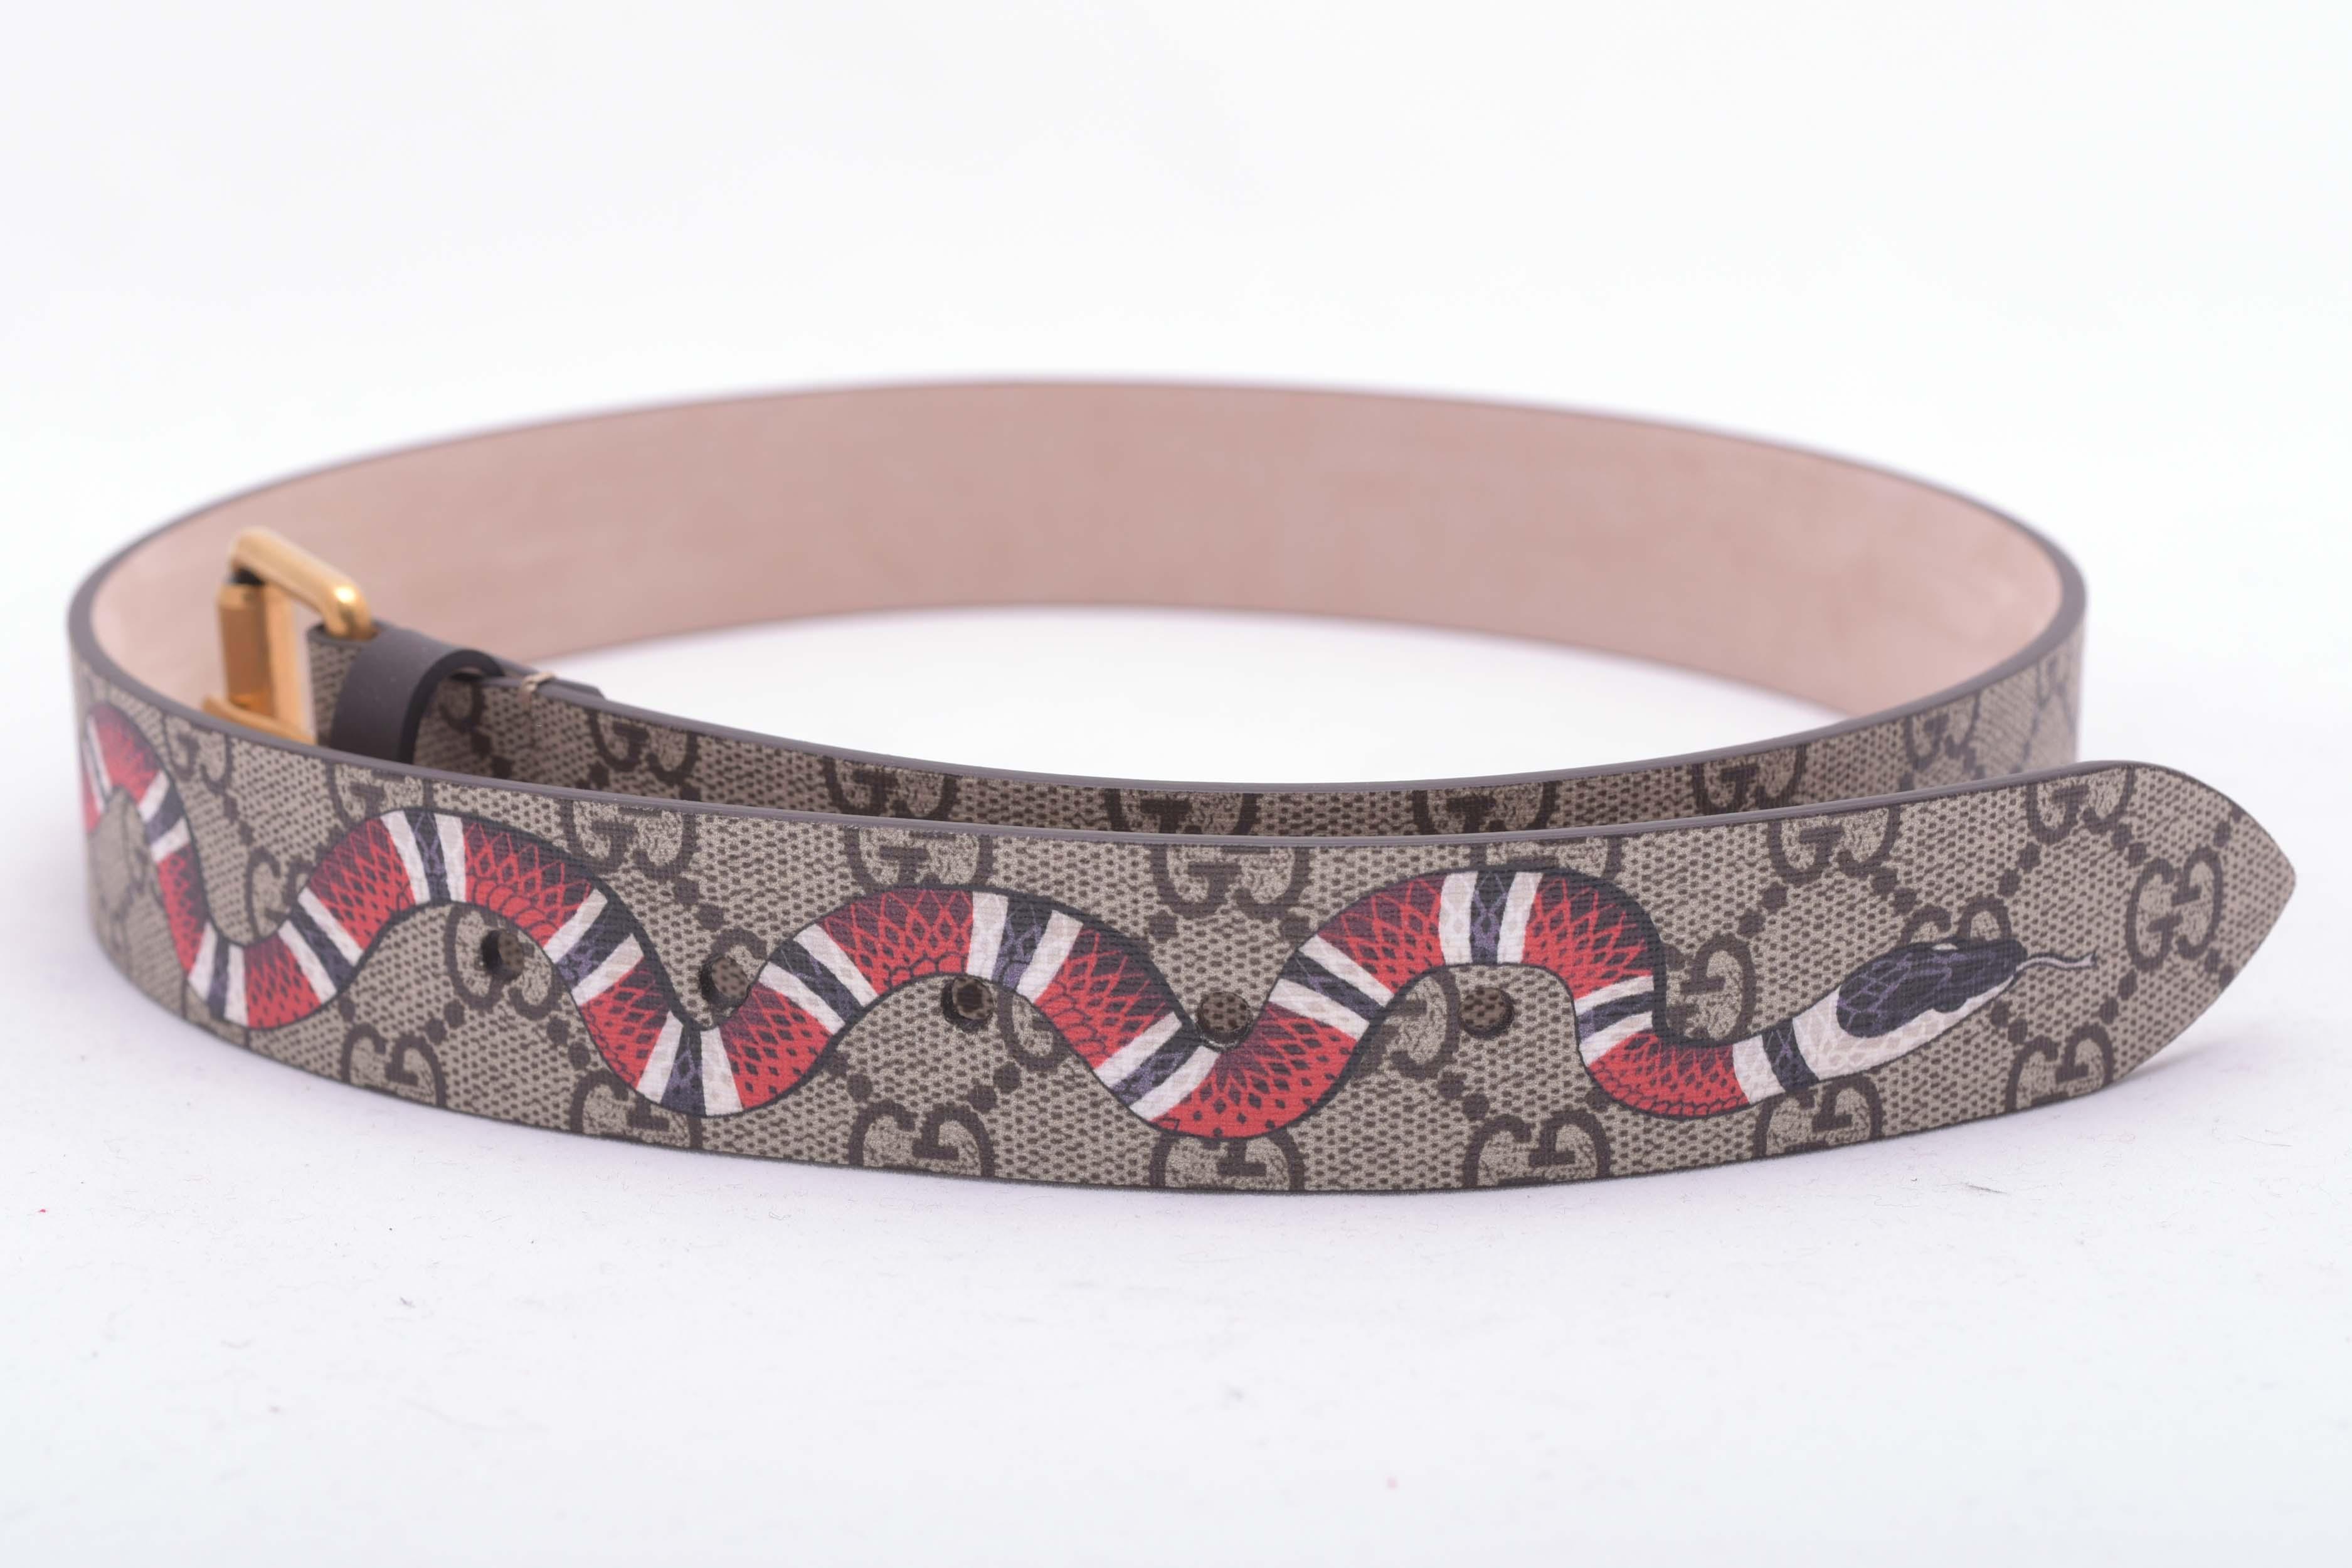 597fcabfc Gucci ×. Snake Print GG Supreme Belt. Size: 30